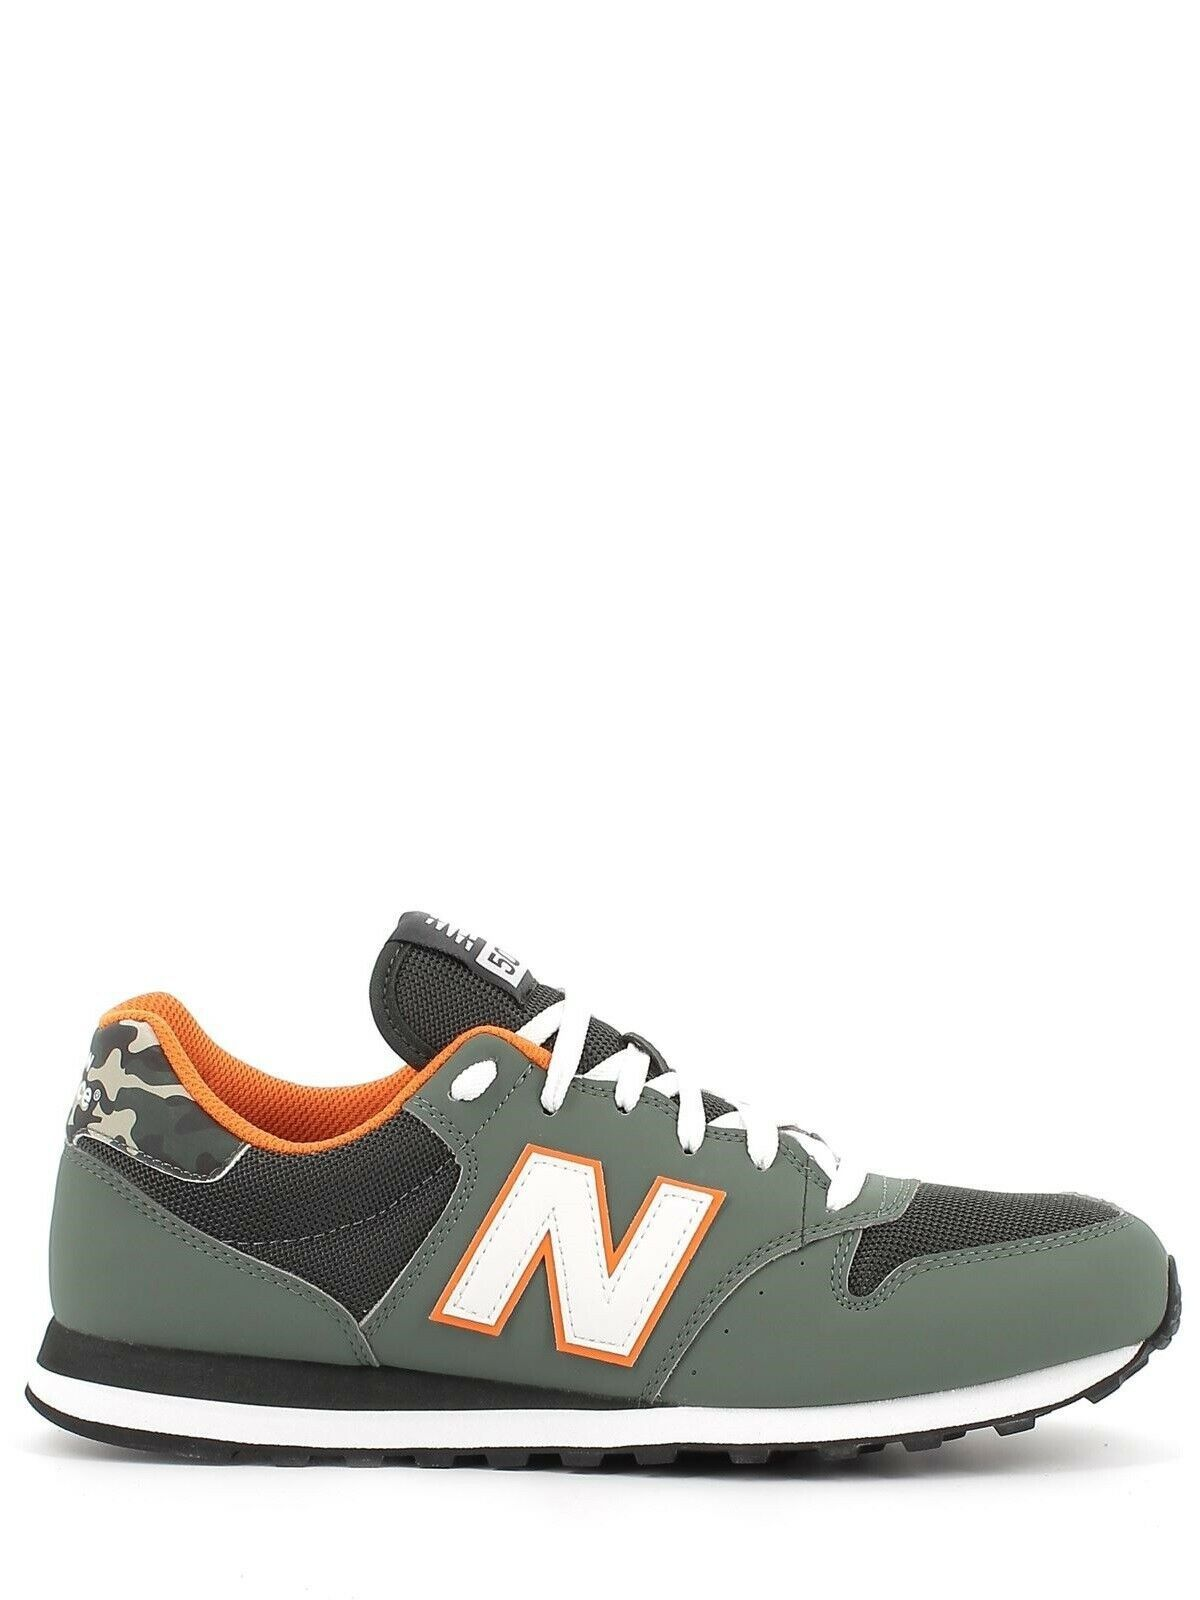 scarpe new balance donna verdi